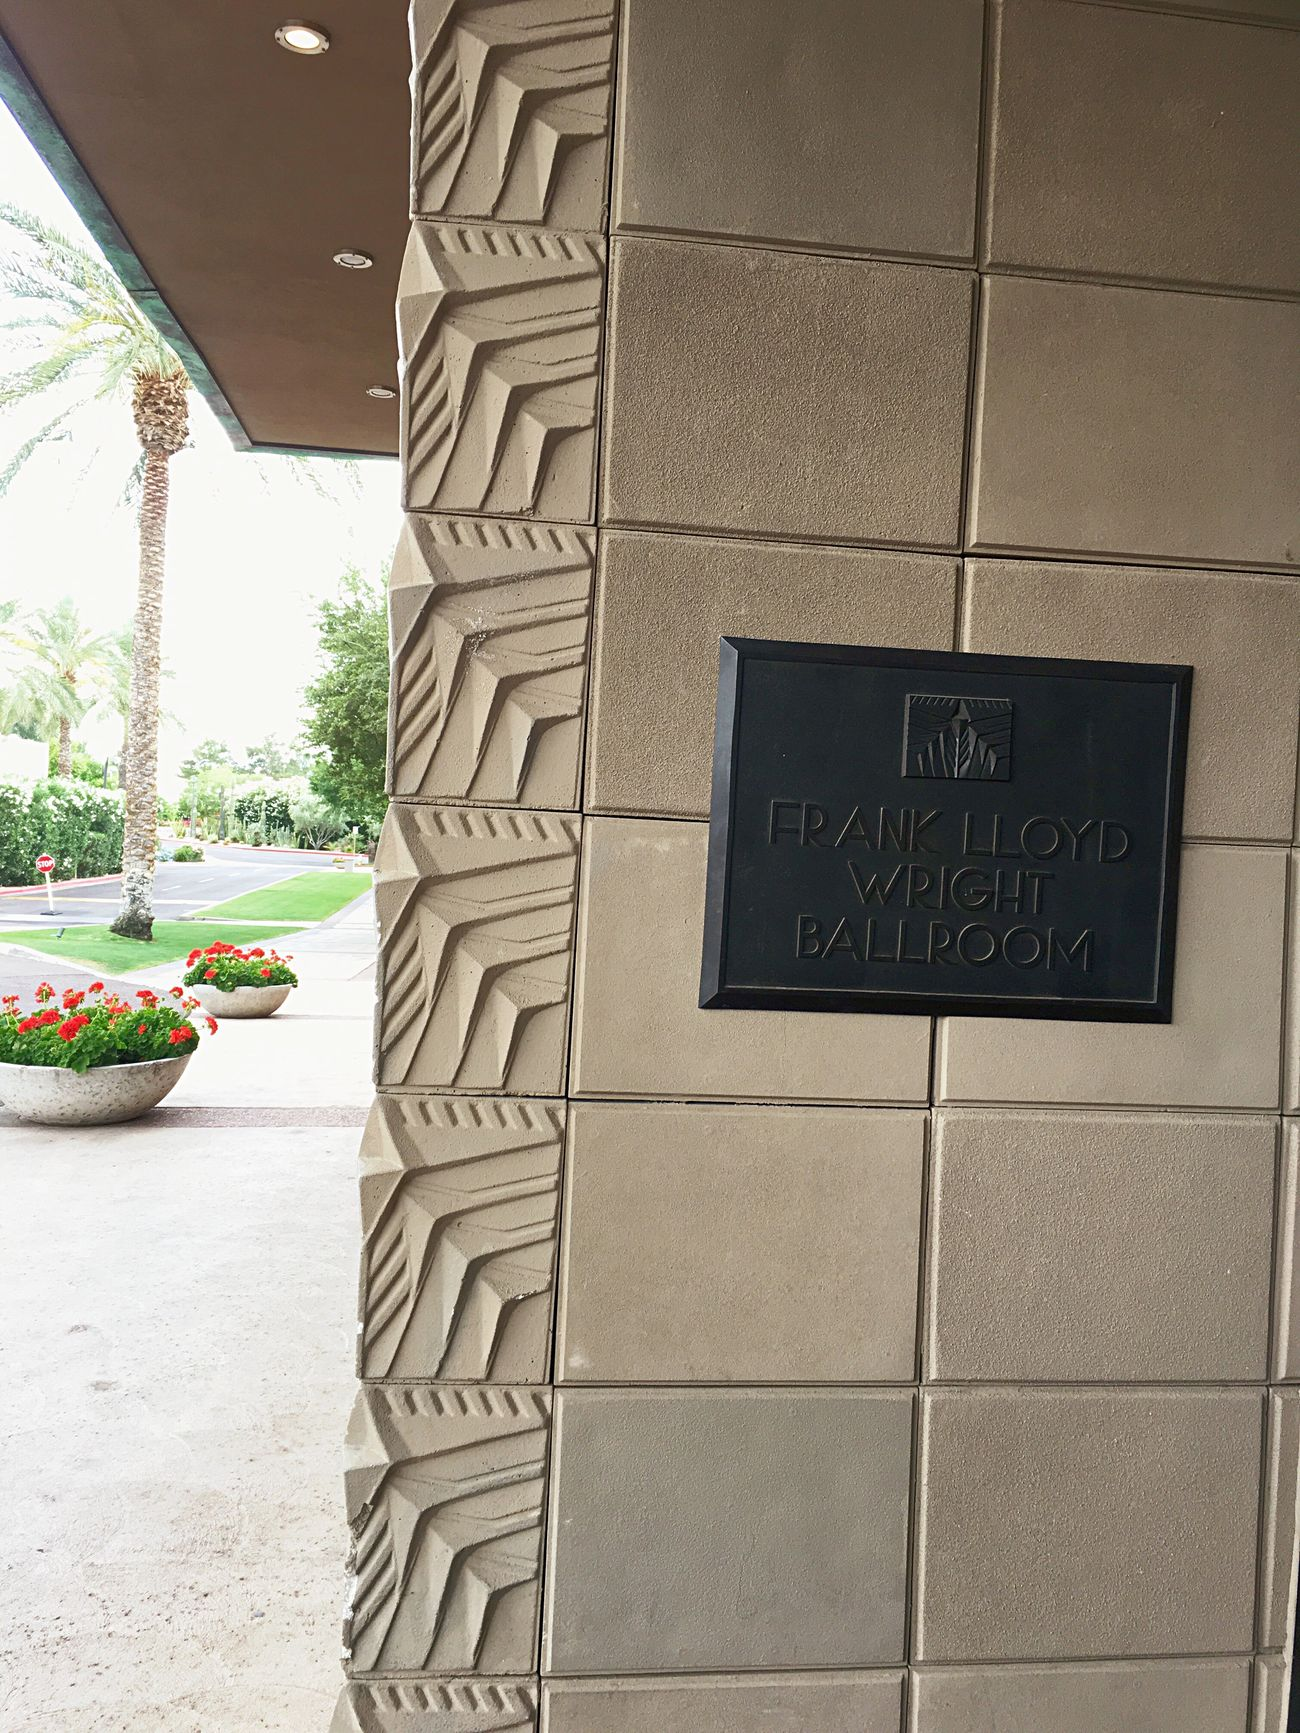 Arizona Waldorf Astoria Resort Travel Travel Destinations Traveling Frank Lloyd Wright Ballroom